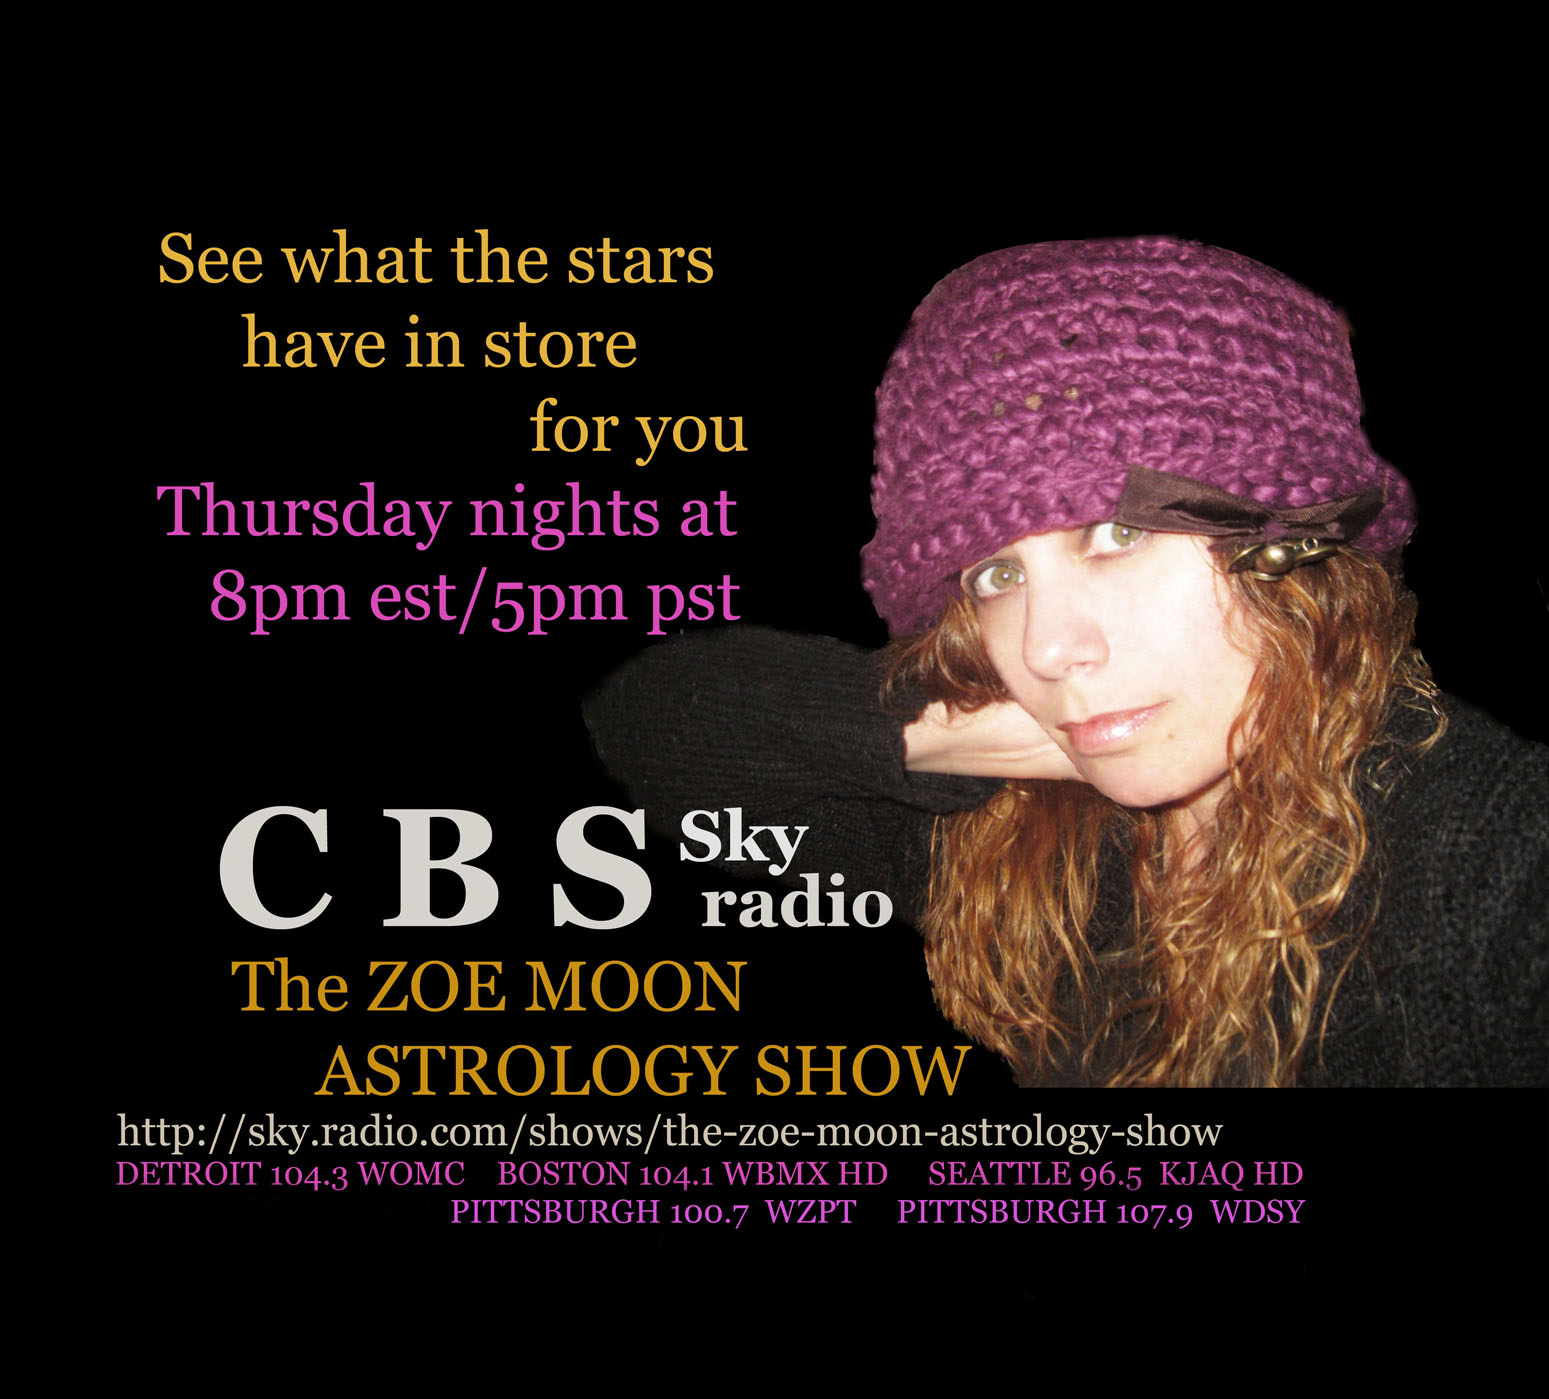 http://1.bp.blogspot.com/-RZHF94UG3Q0/T9J28M3WqvI/AAAAAAAABT8/2ldpuNTrTH0/s1600/zoe+moon+cbs+station+promo.jpg